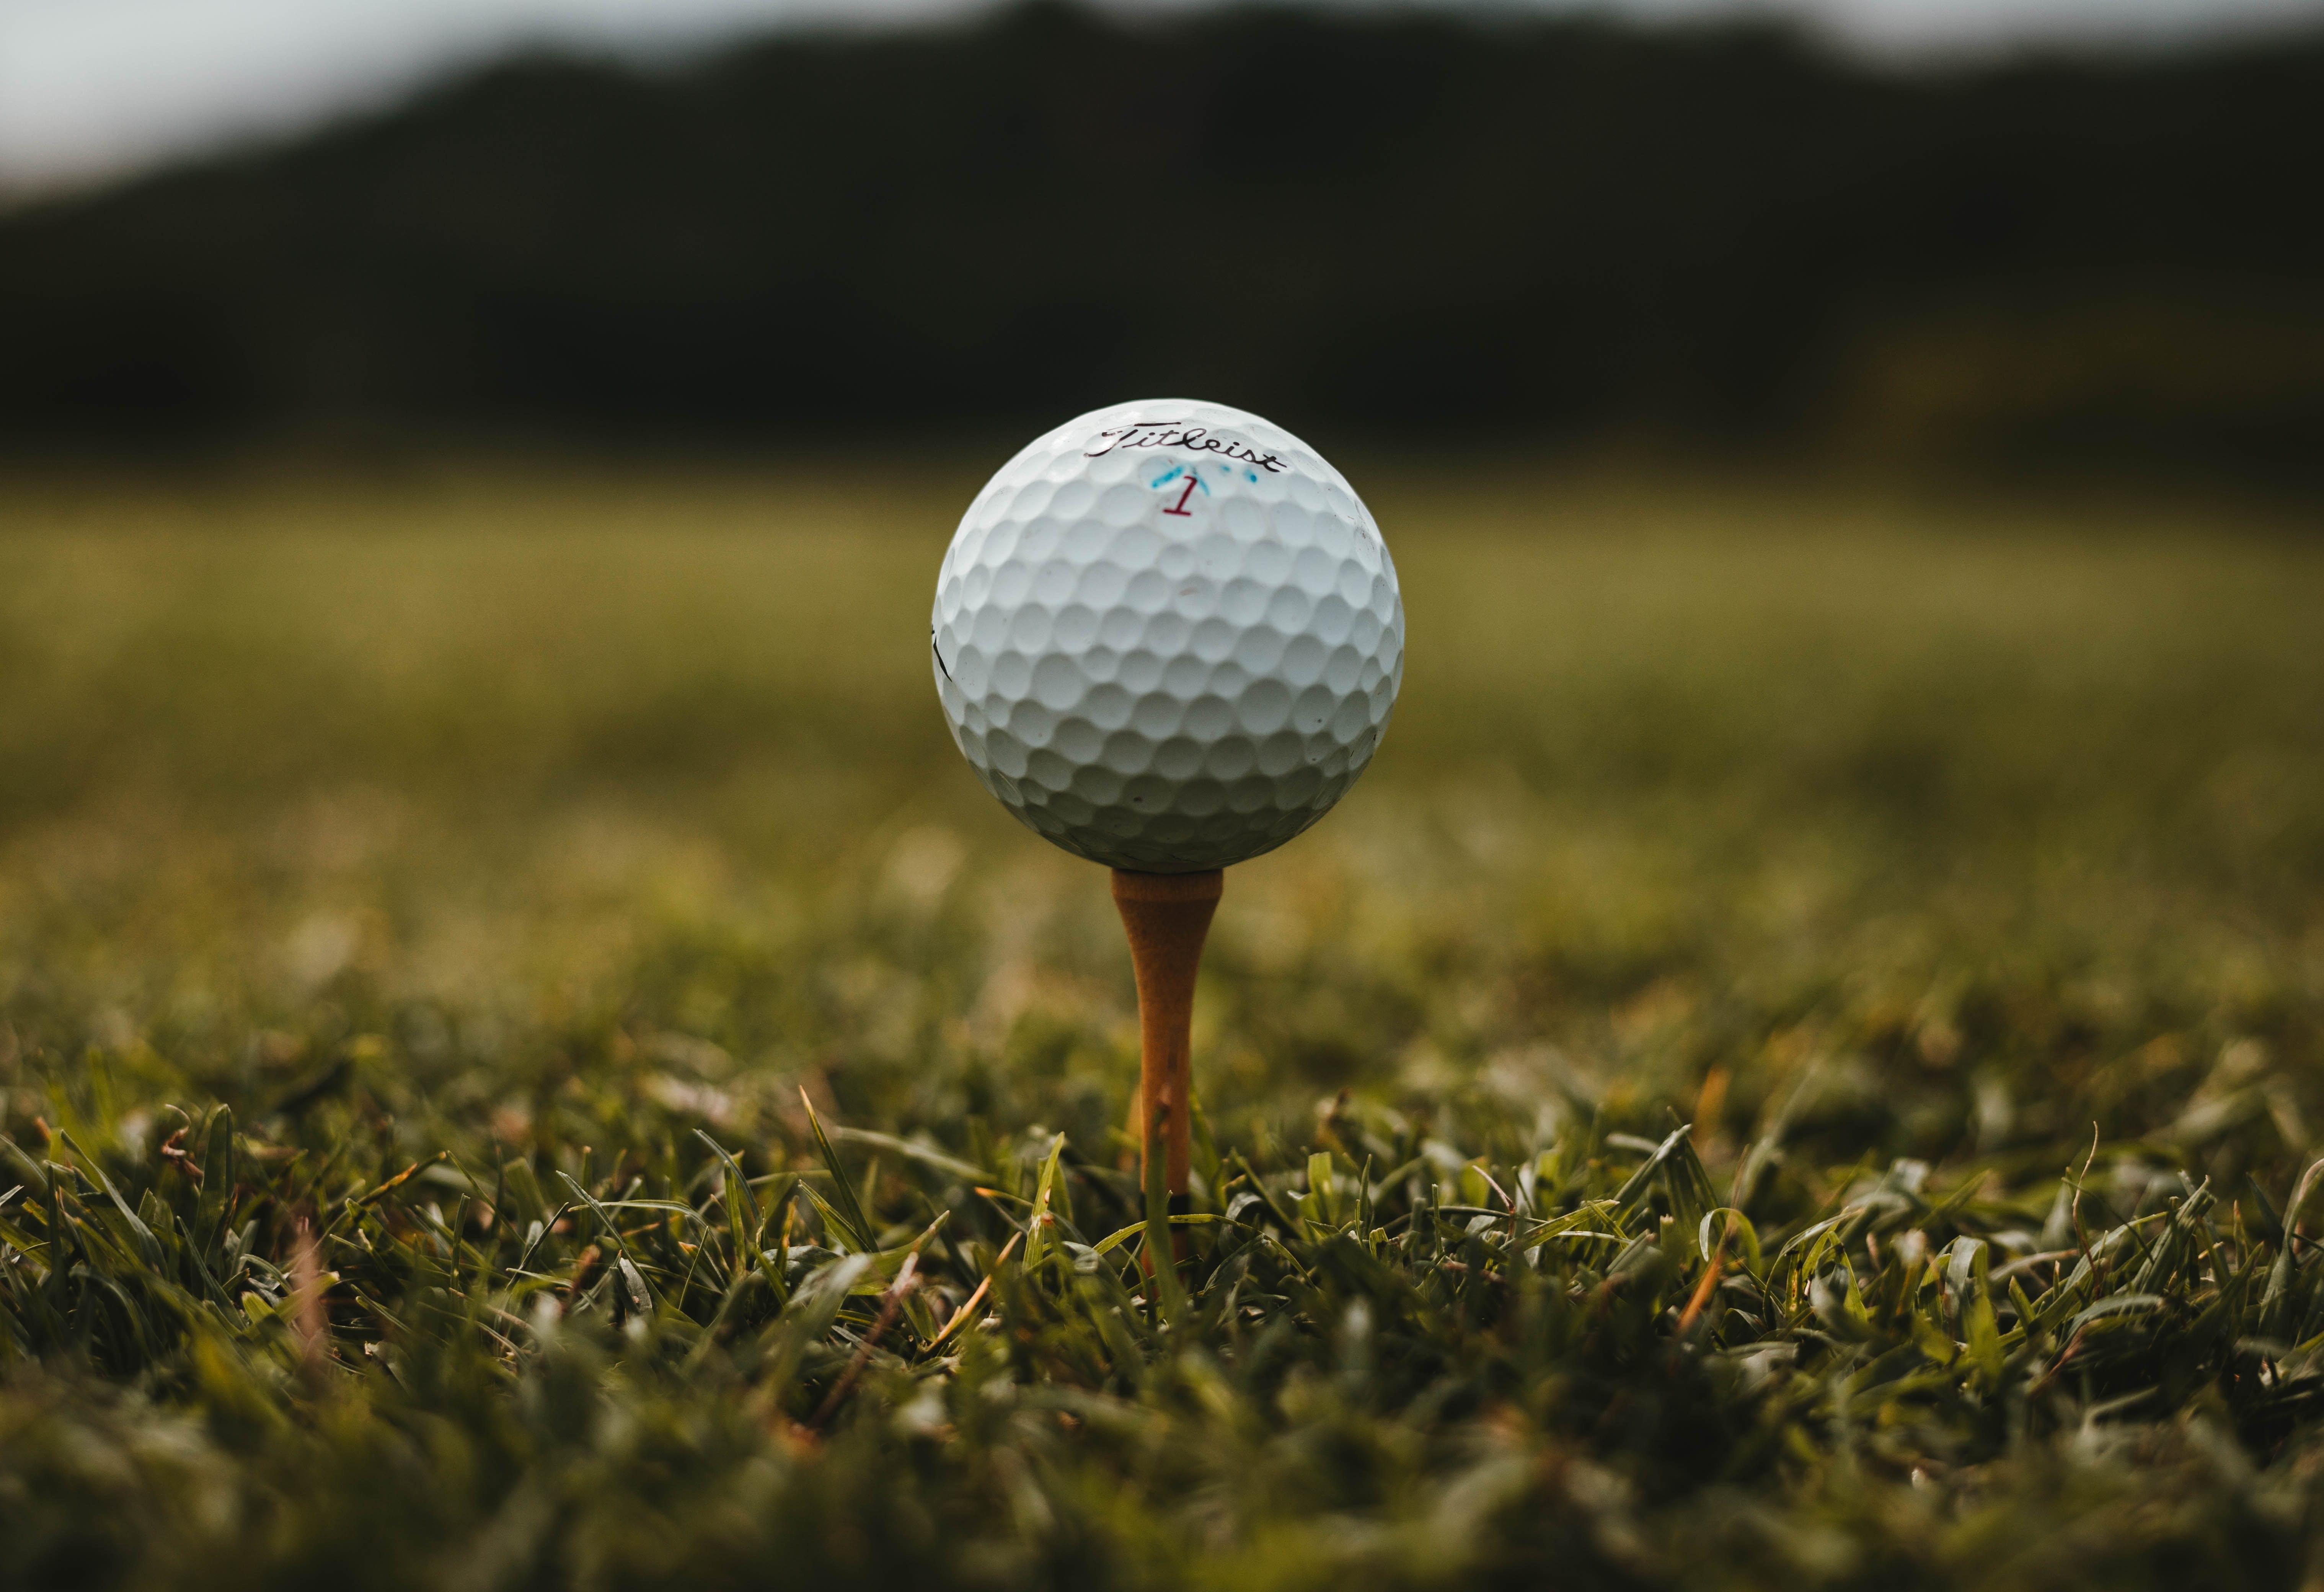 Golf ball on tee; image by Will Porada, via Unsplash.com.